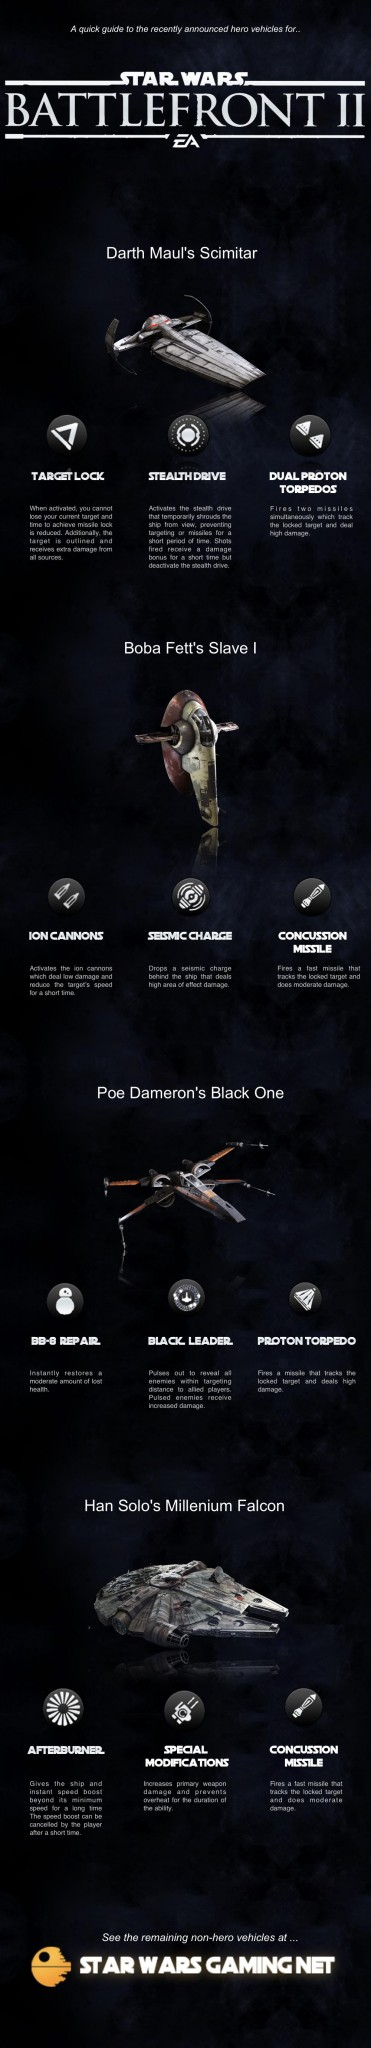 Star Wars Battlefront II Hero Vehicles Abilities Detailed